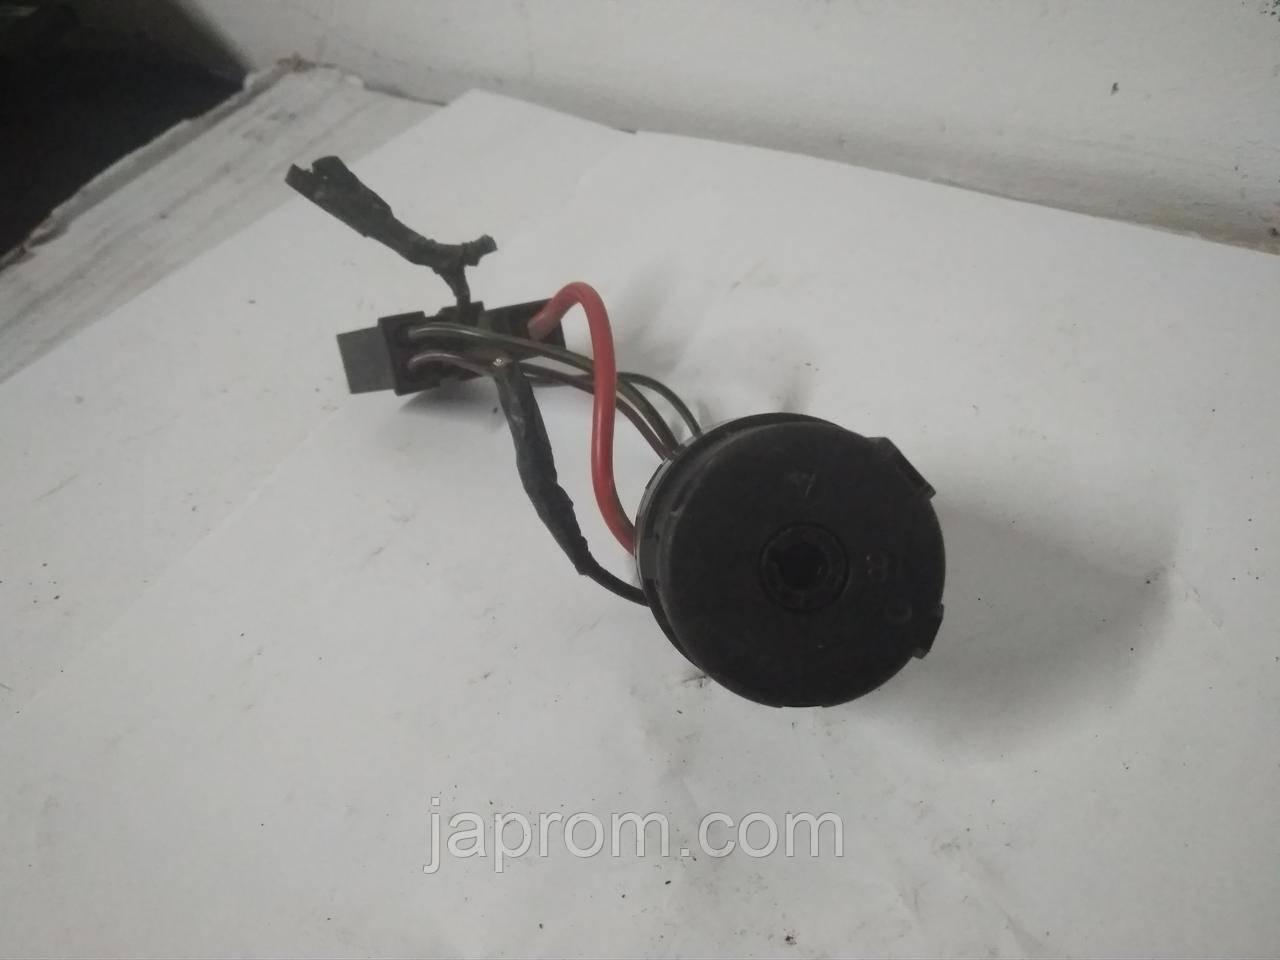 Контактна група замка запалювання MB Sprinter/Vito 638/ VW LT (-06)